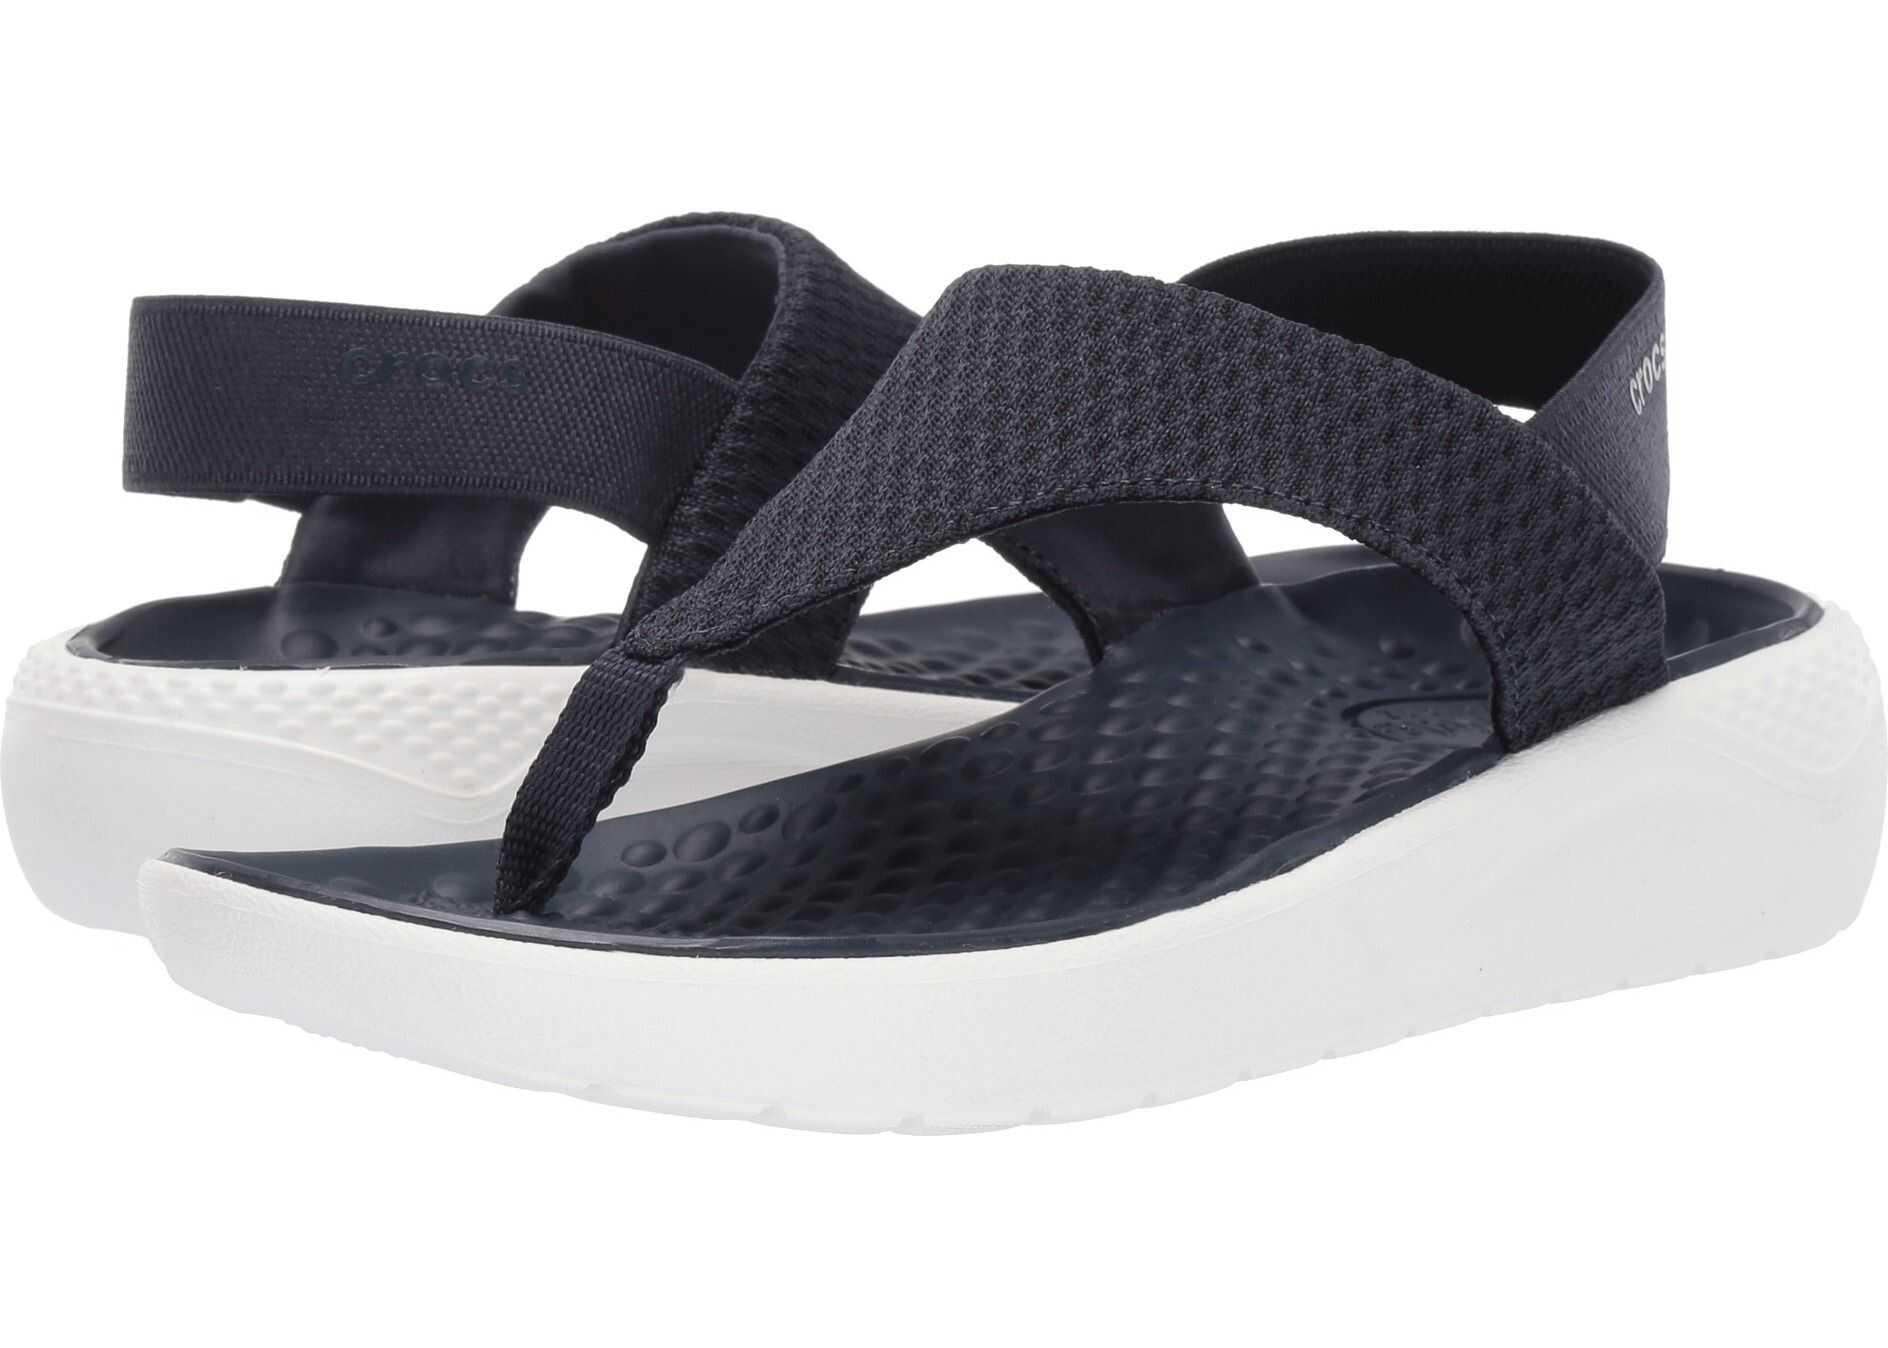 Crocs LiteRide Mesh Flip Navy/White